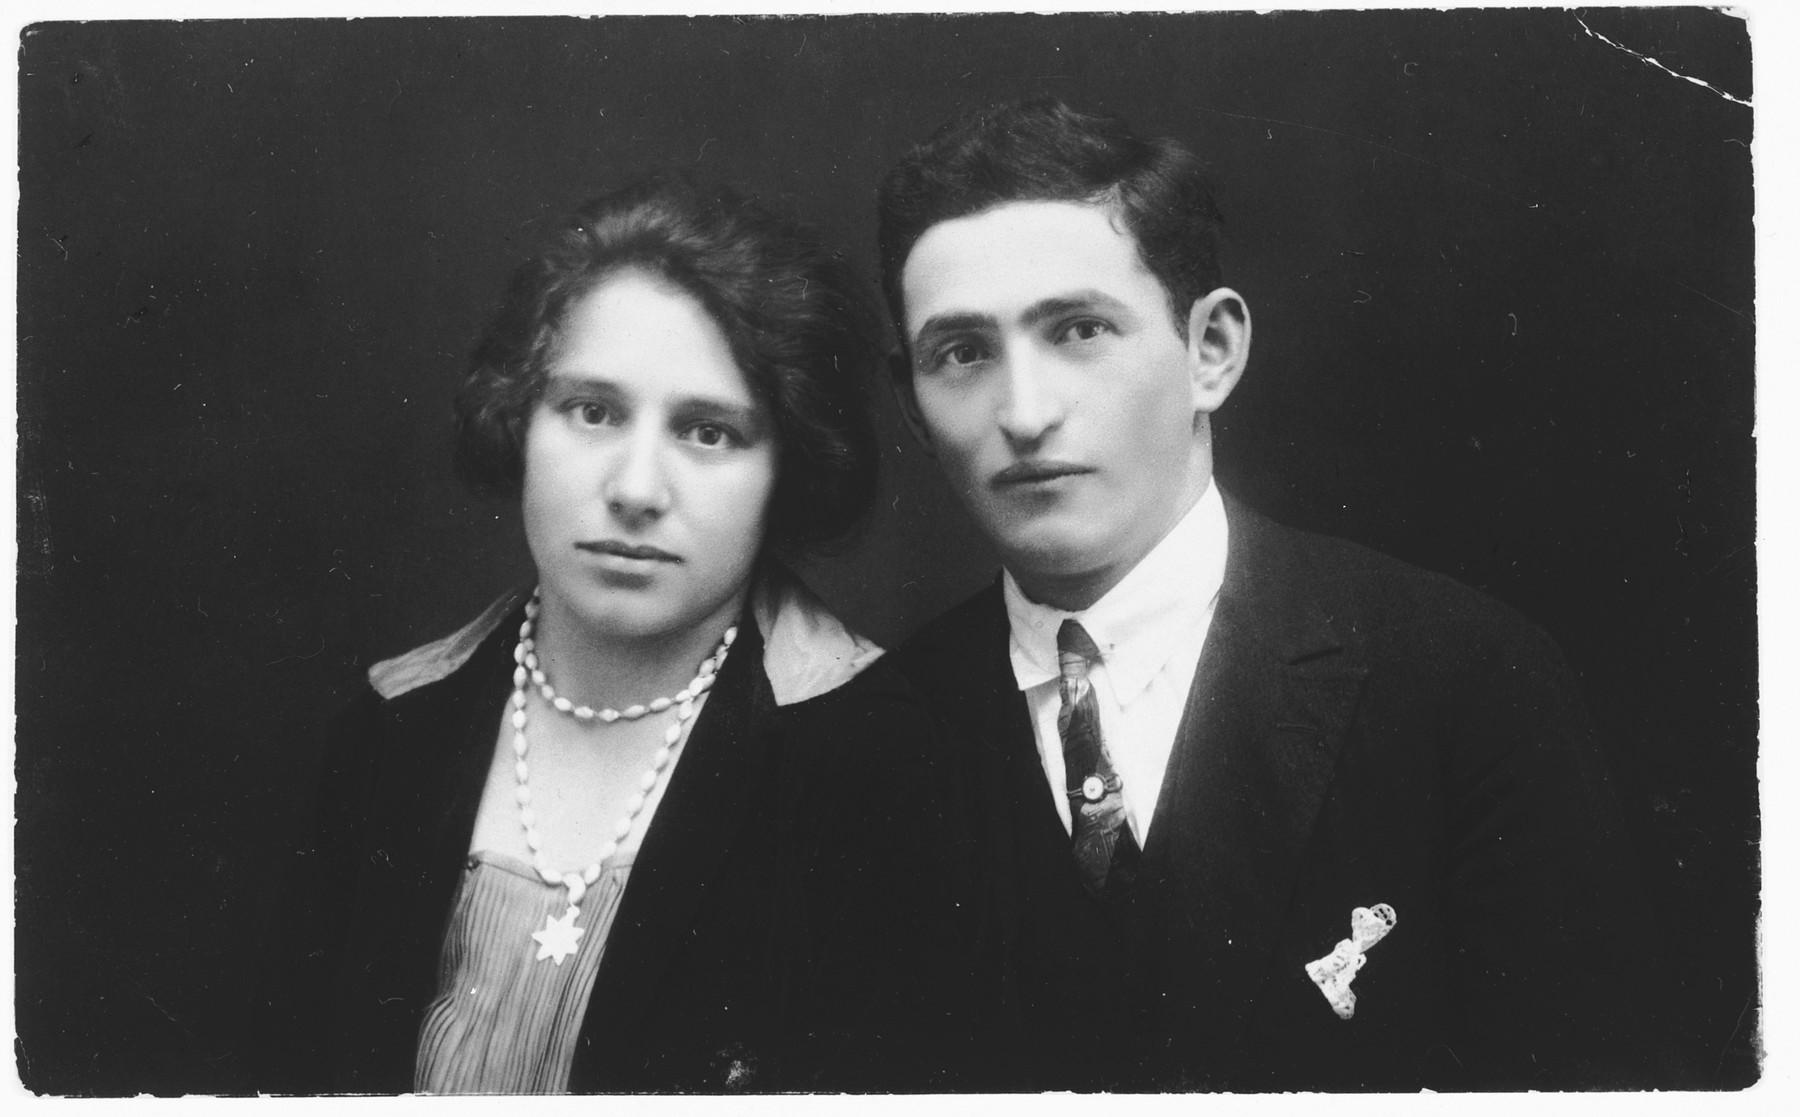 Portrait [probably an engagement photograph] of Irina Farkas and Eugene Berkovits.